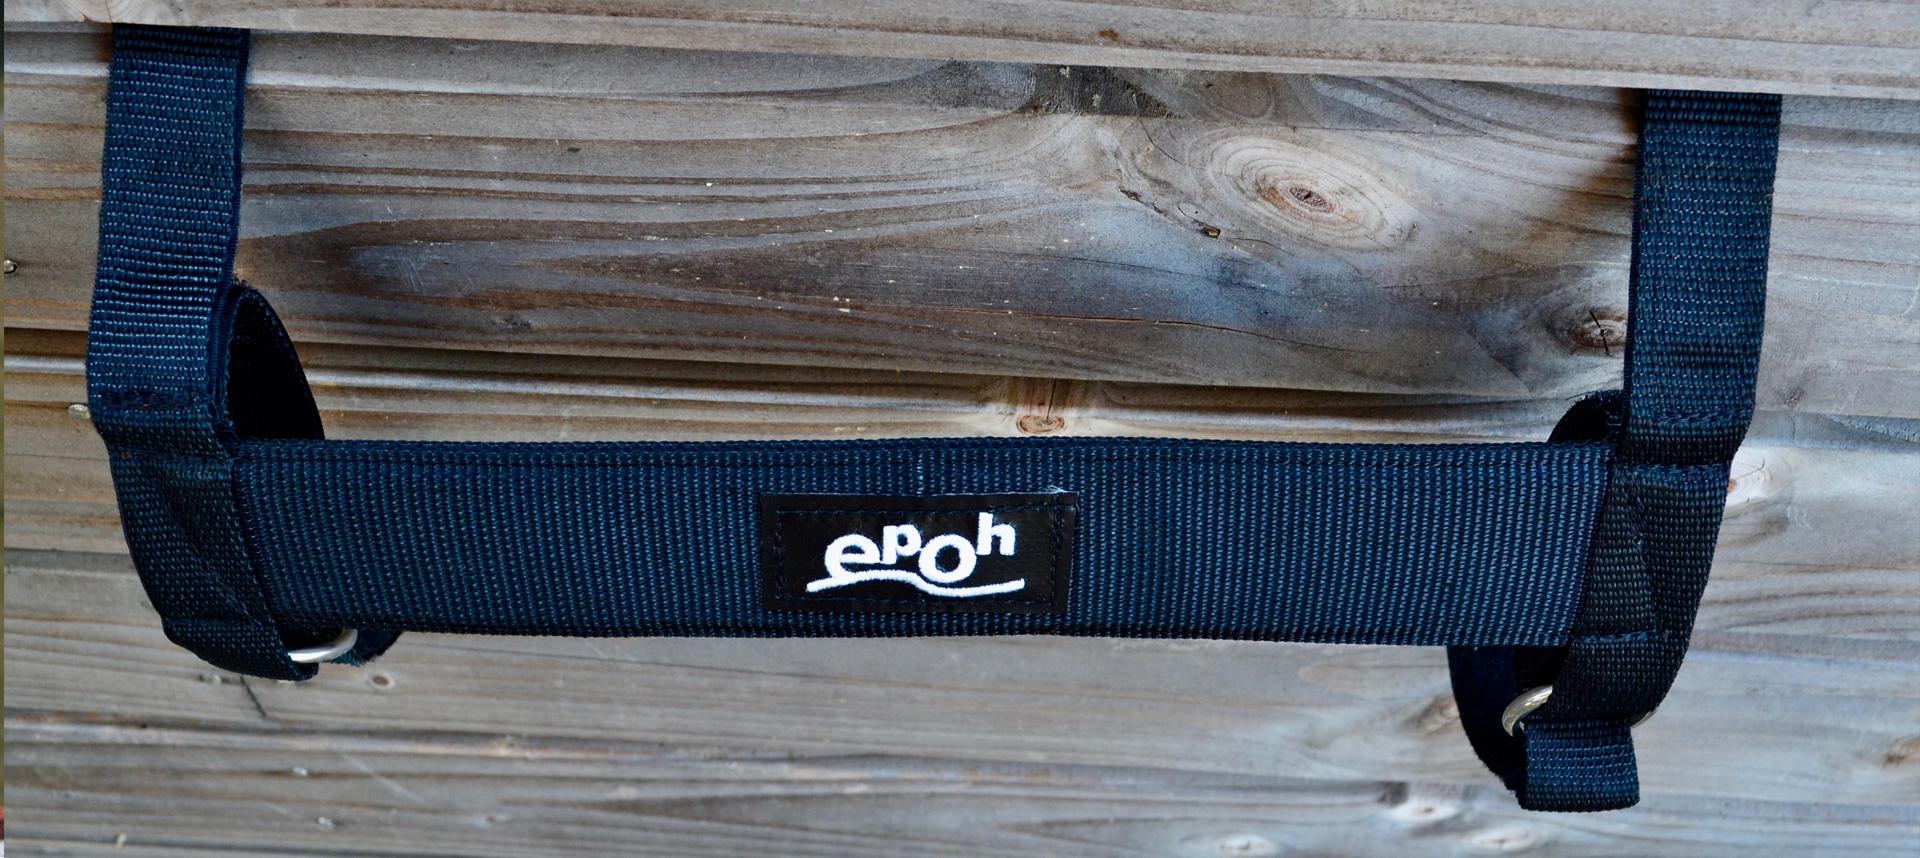 Epoh-accastillage-bootstrap